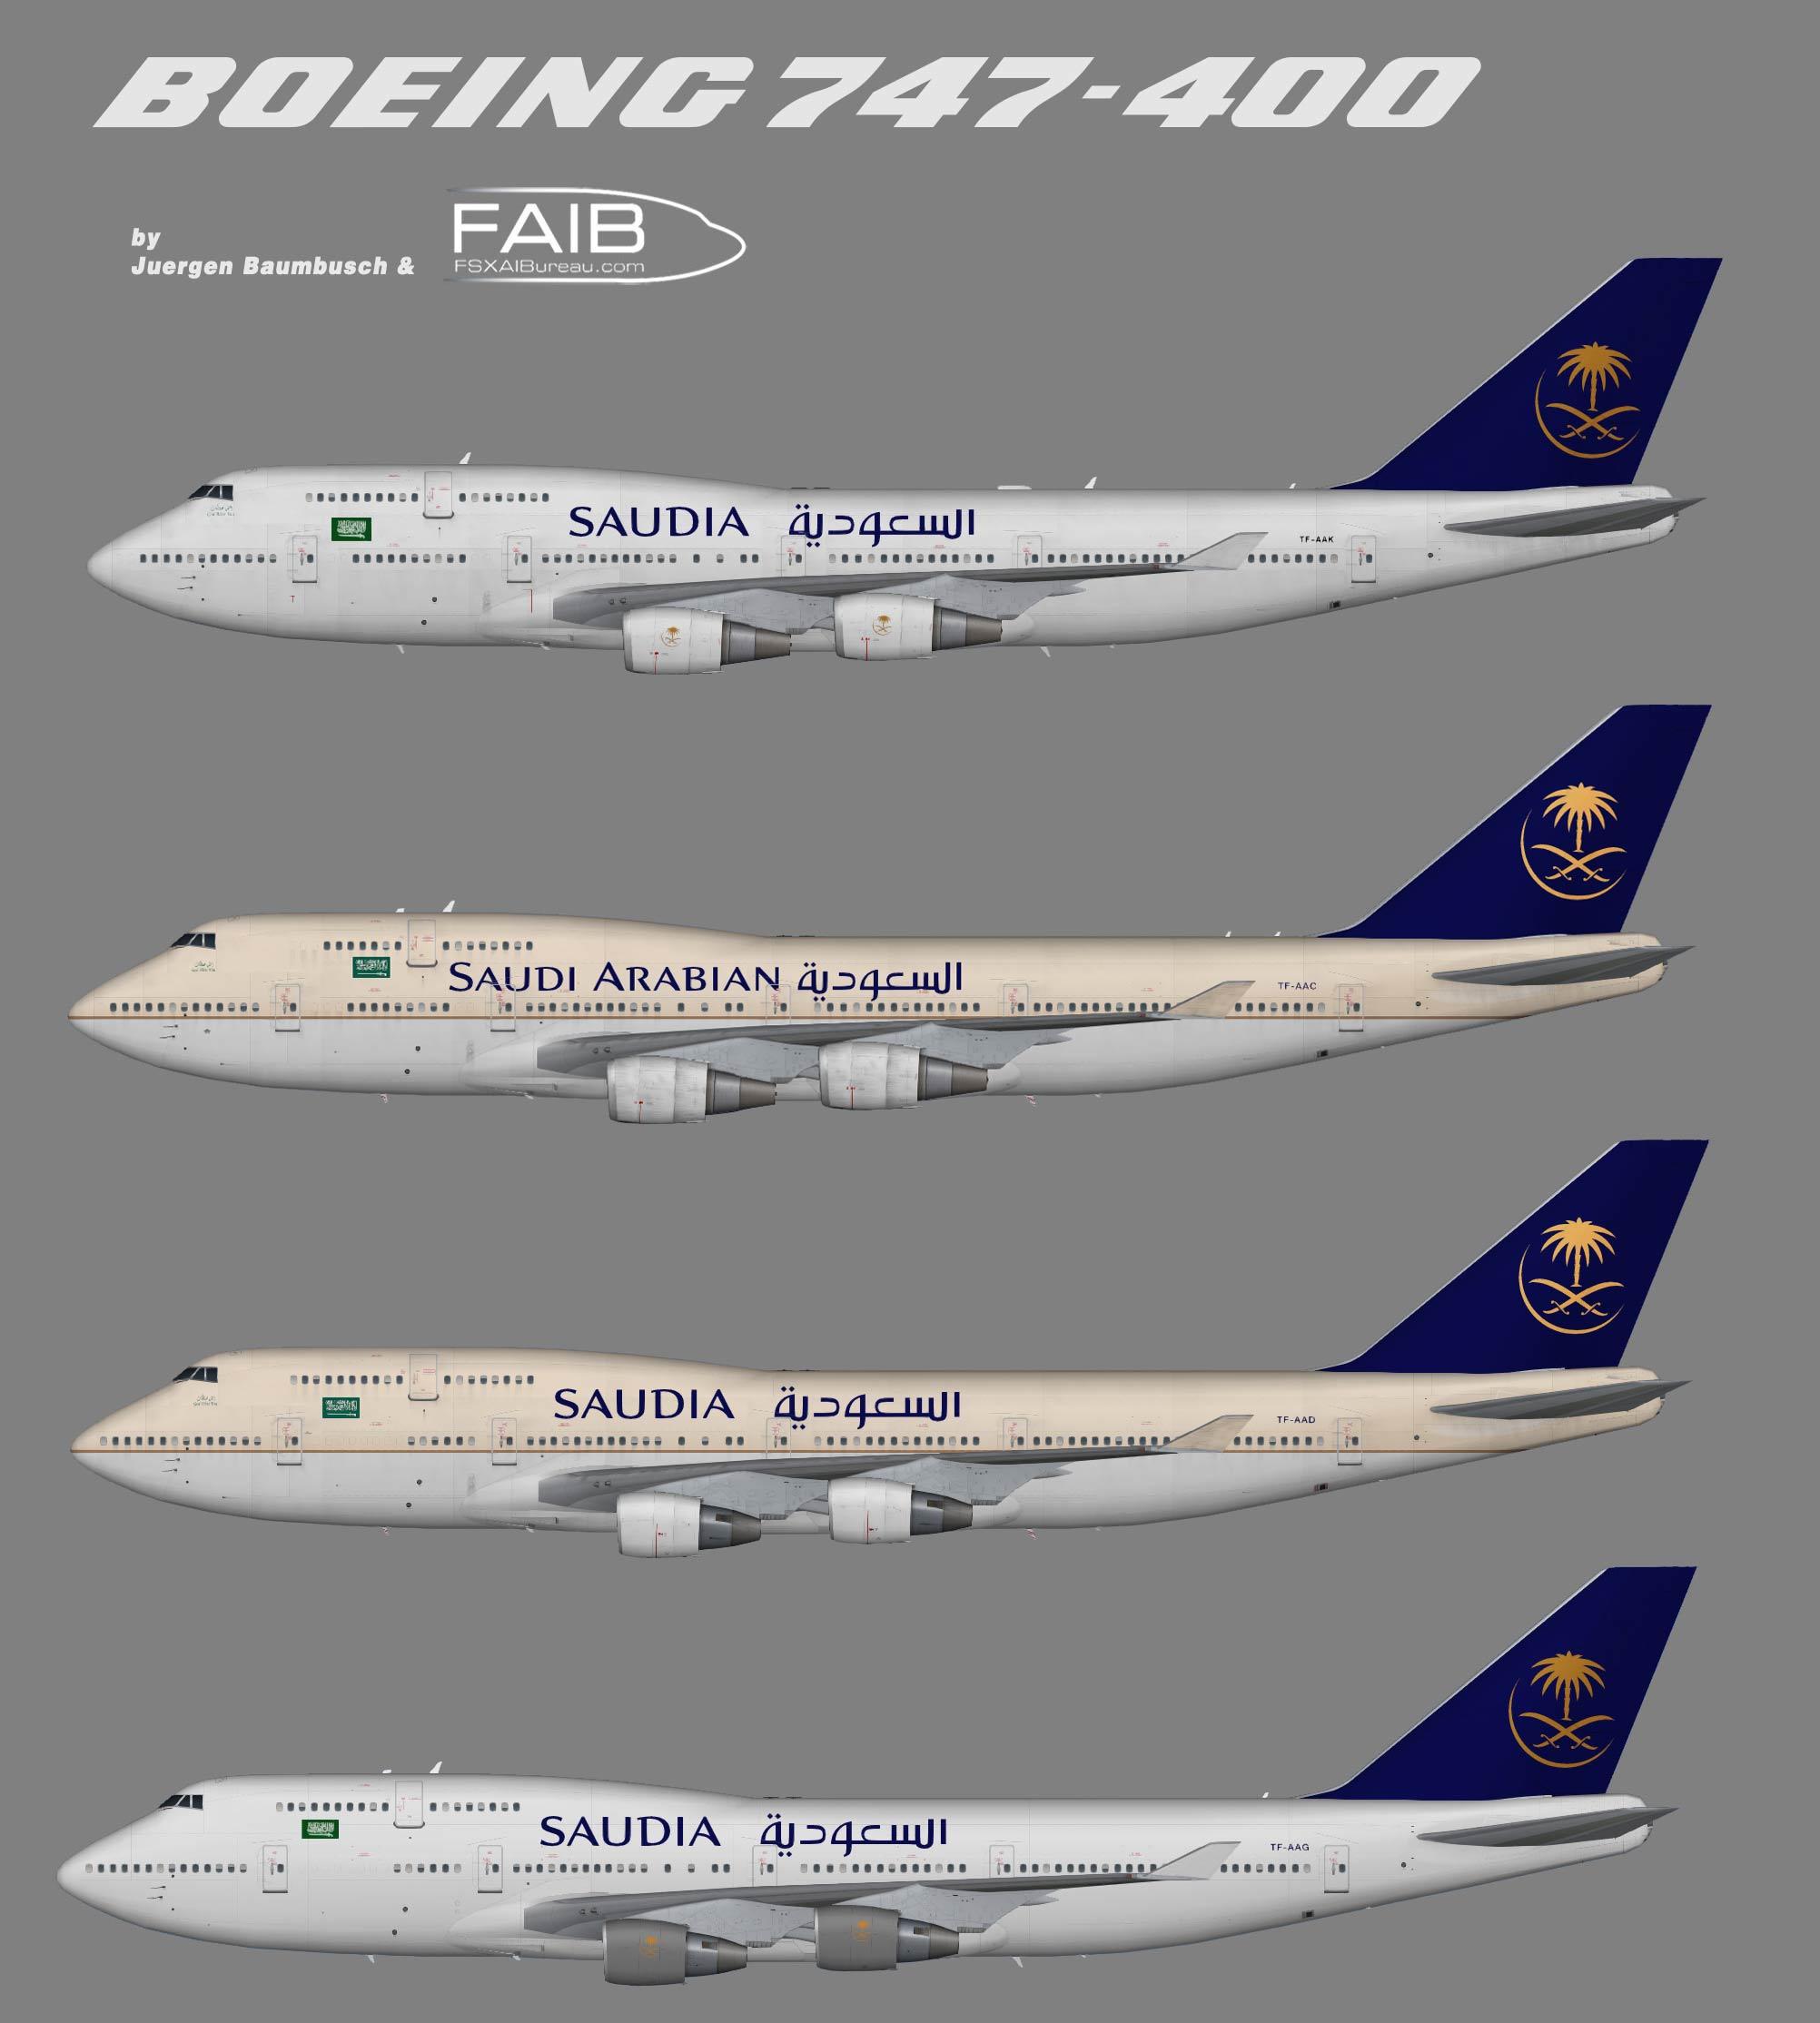 Saudia Boeing 747-400